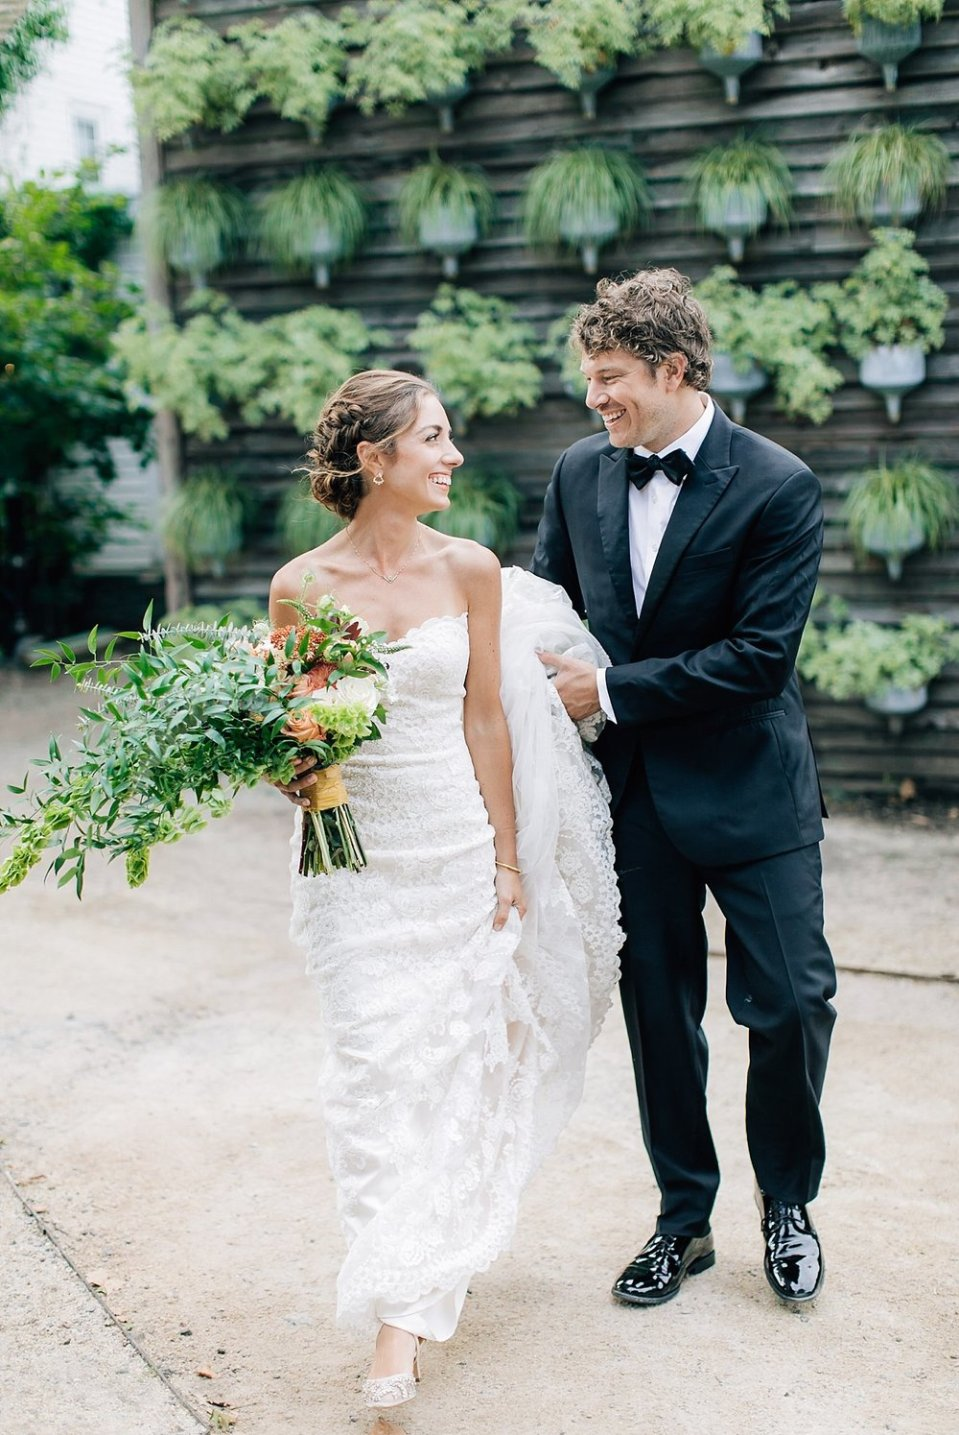 terrain gatherings glen mills pa romantic garden wedding photography magdalena studios 0023